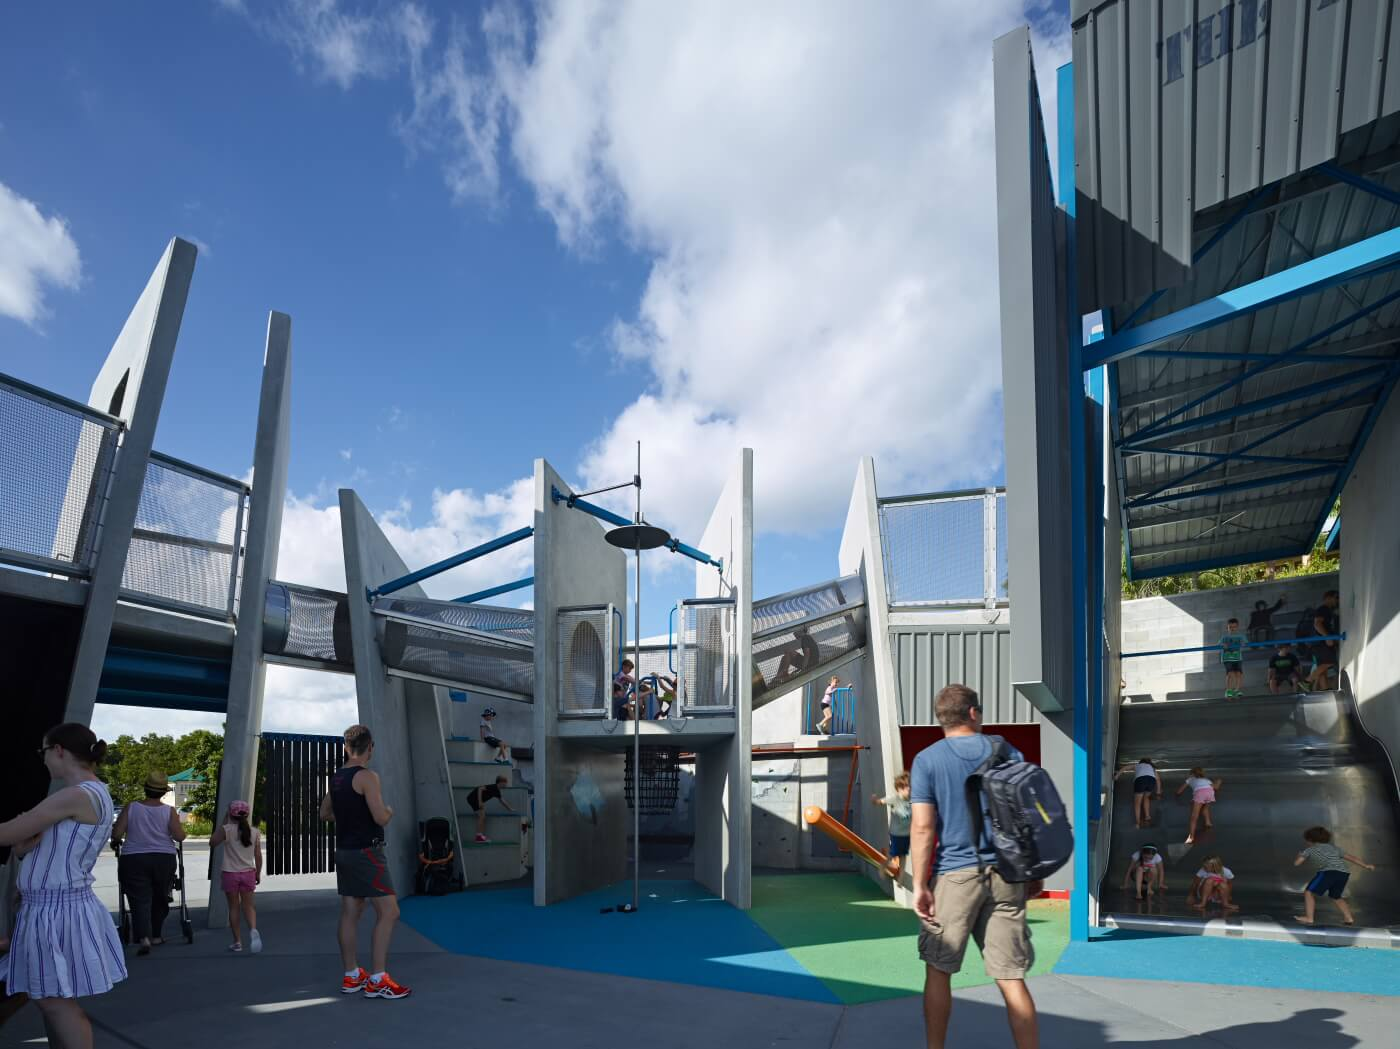 Frew-park-arena-playground-guymer-bailey-06.JPG